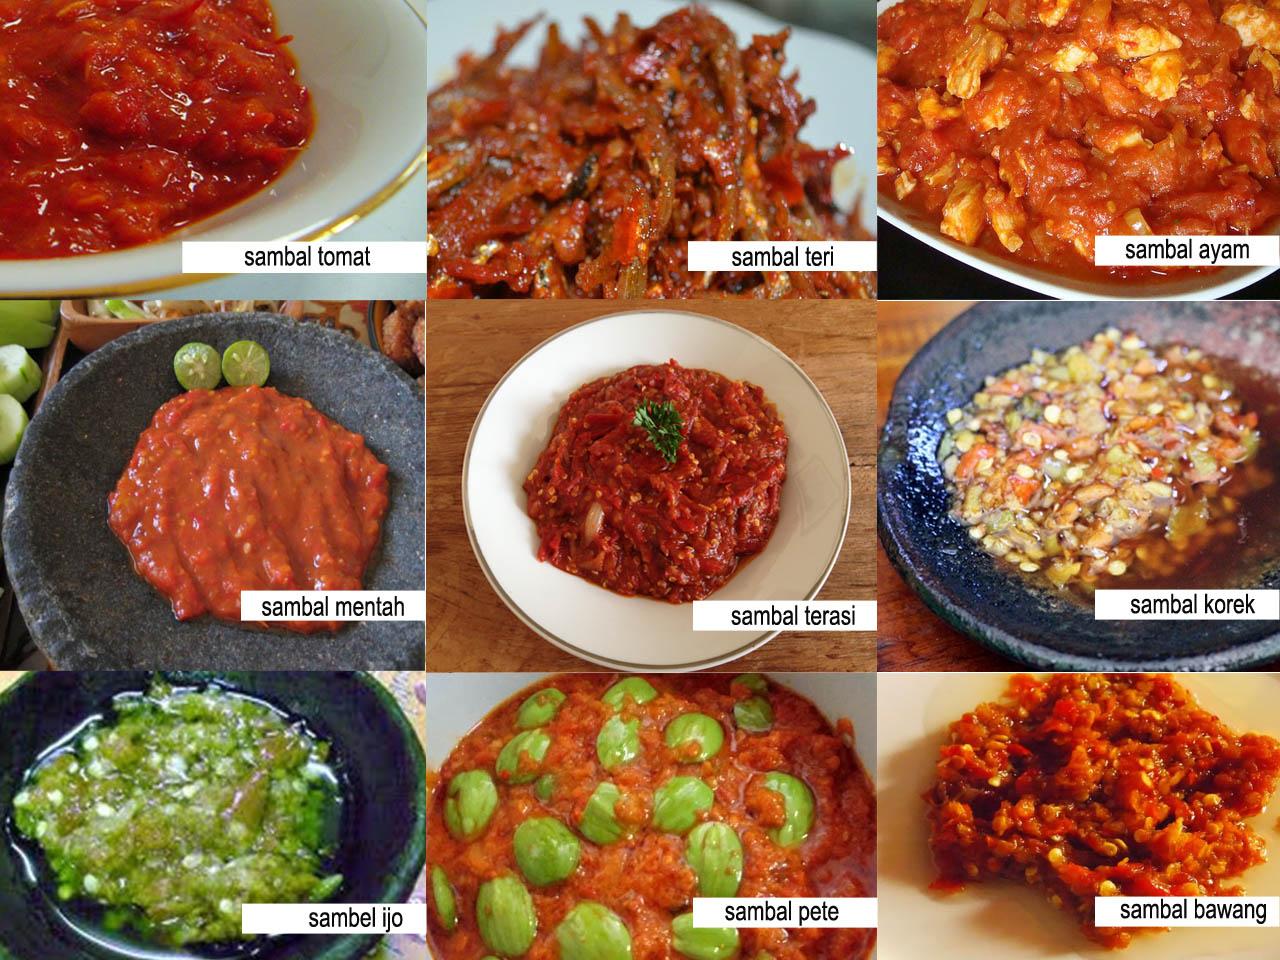 Ragam sambal di Indonesia (sumber : Delivery Foods Jogja - blogger)